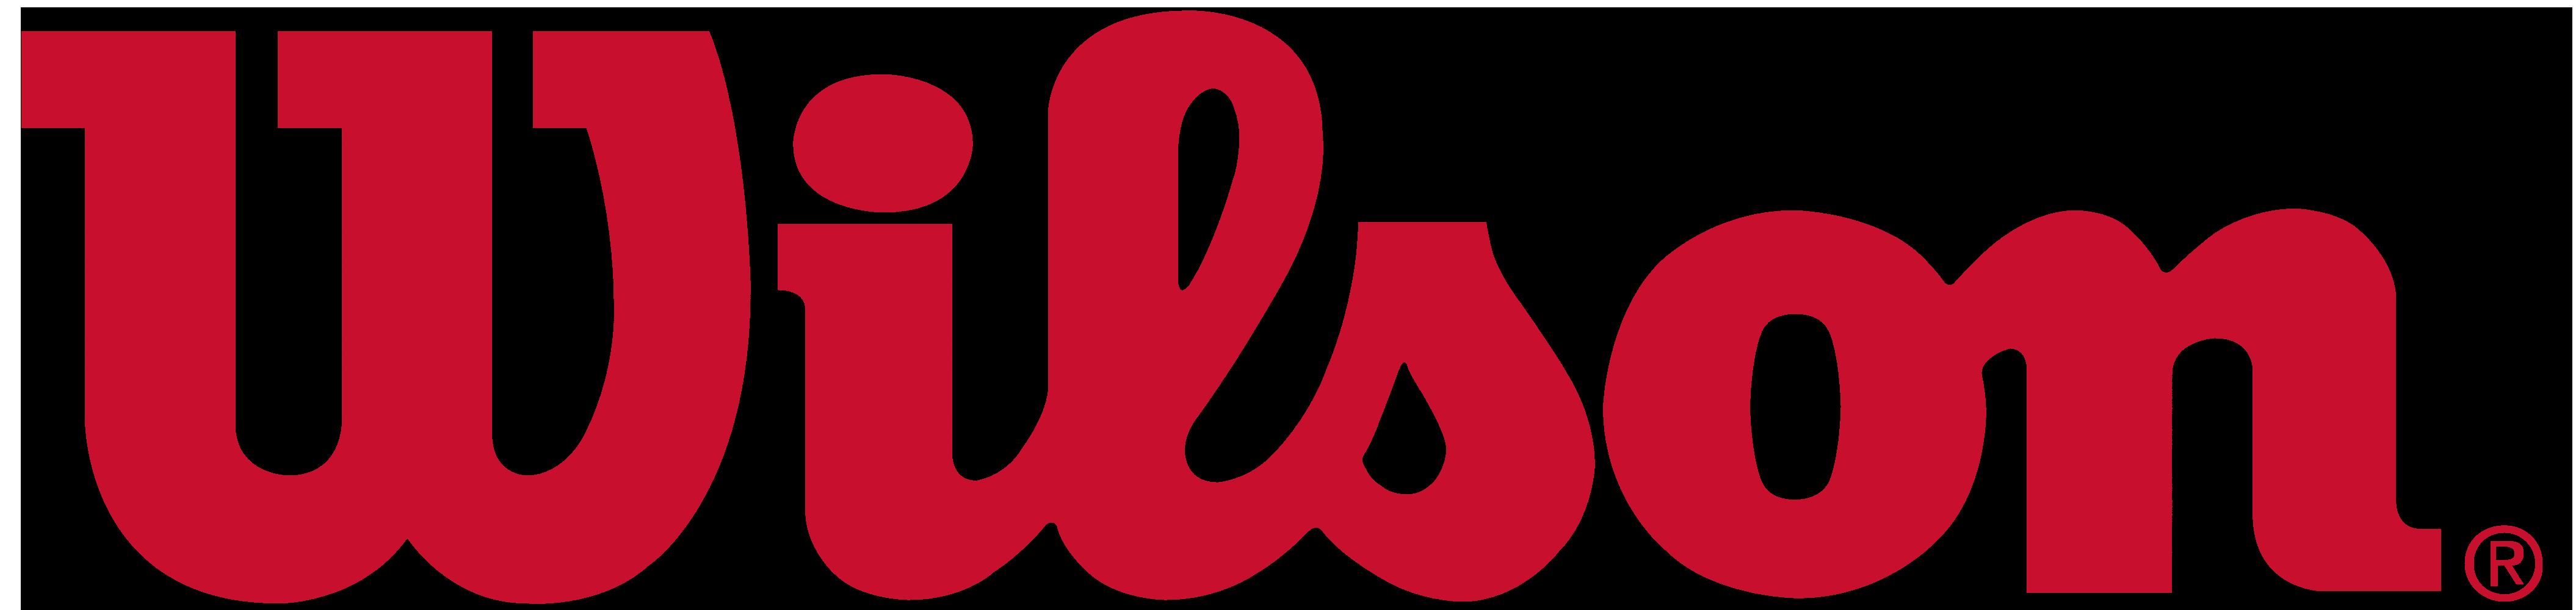 Wilson Logos Download